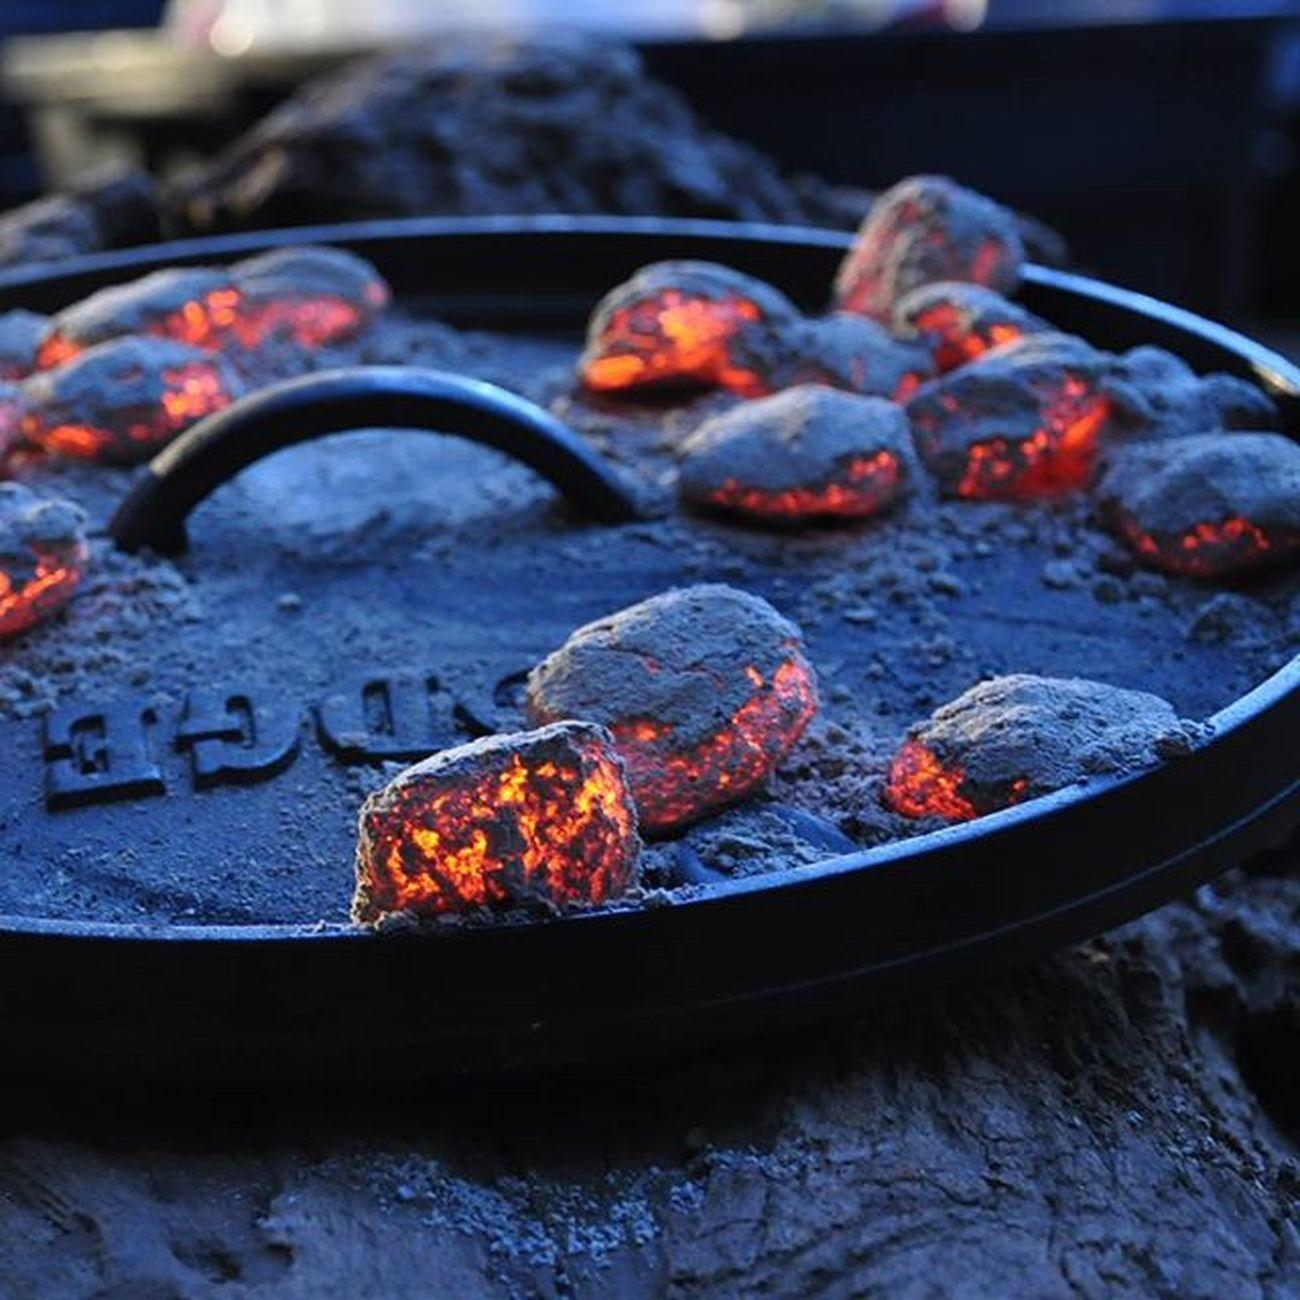 Ready for some outdoor cooking again! Camping Lodgecastiron Campfire Nikond90 Nikonnofilter Nikonusa NikonForever